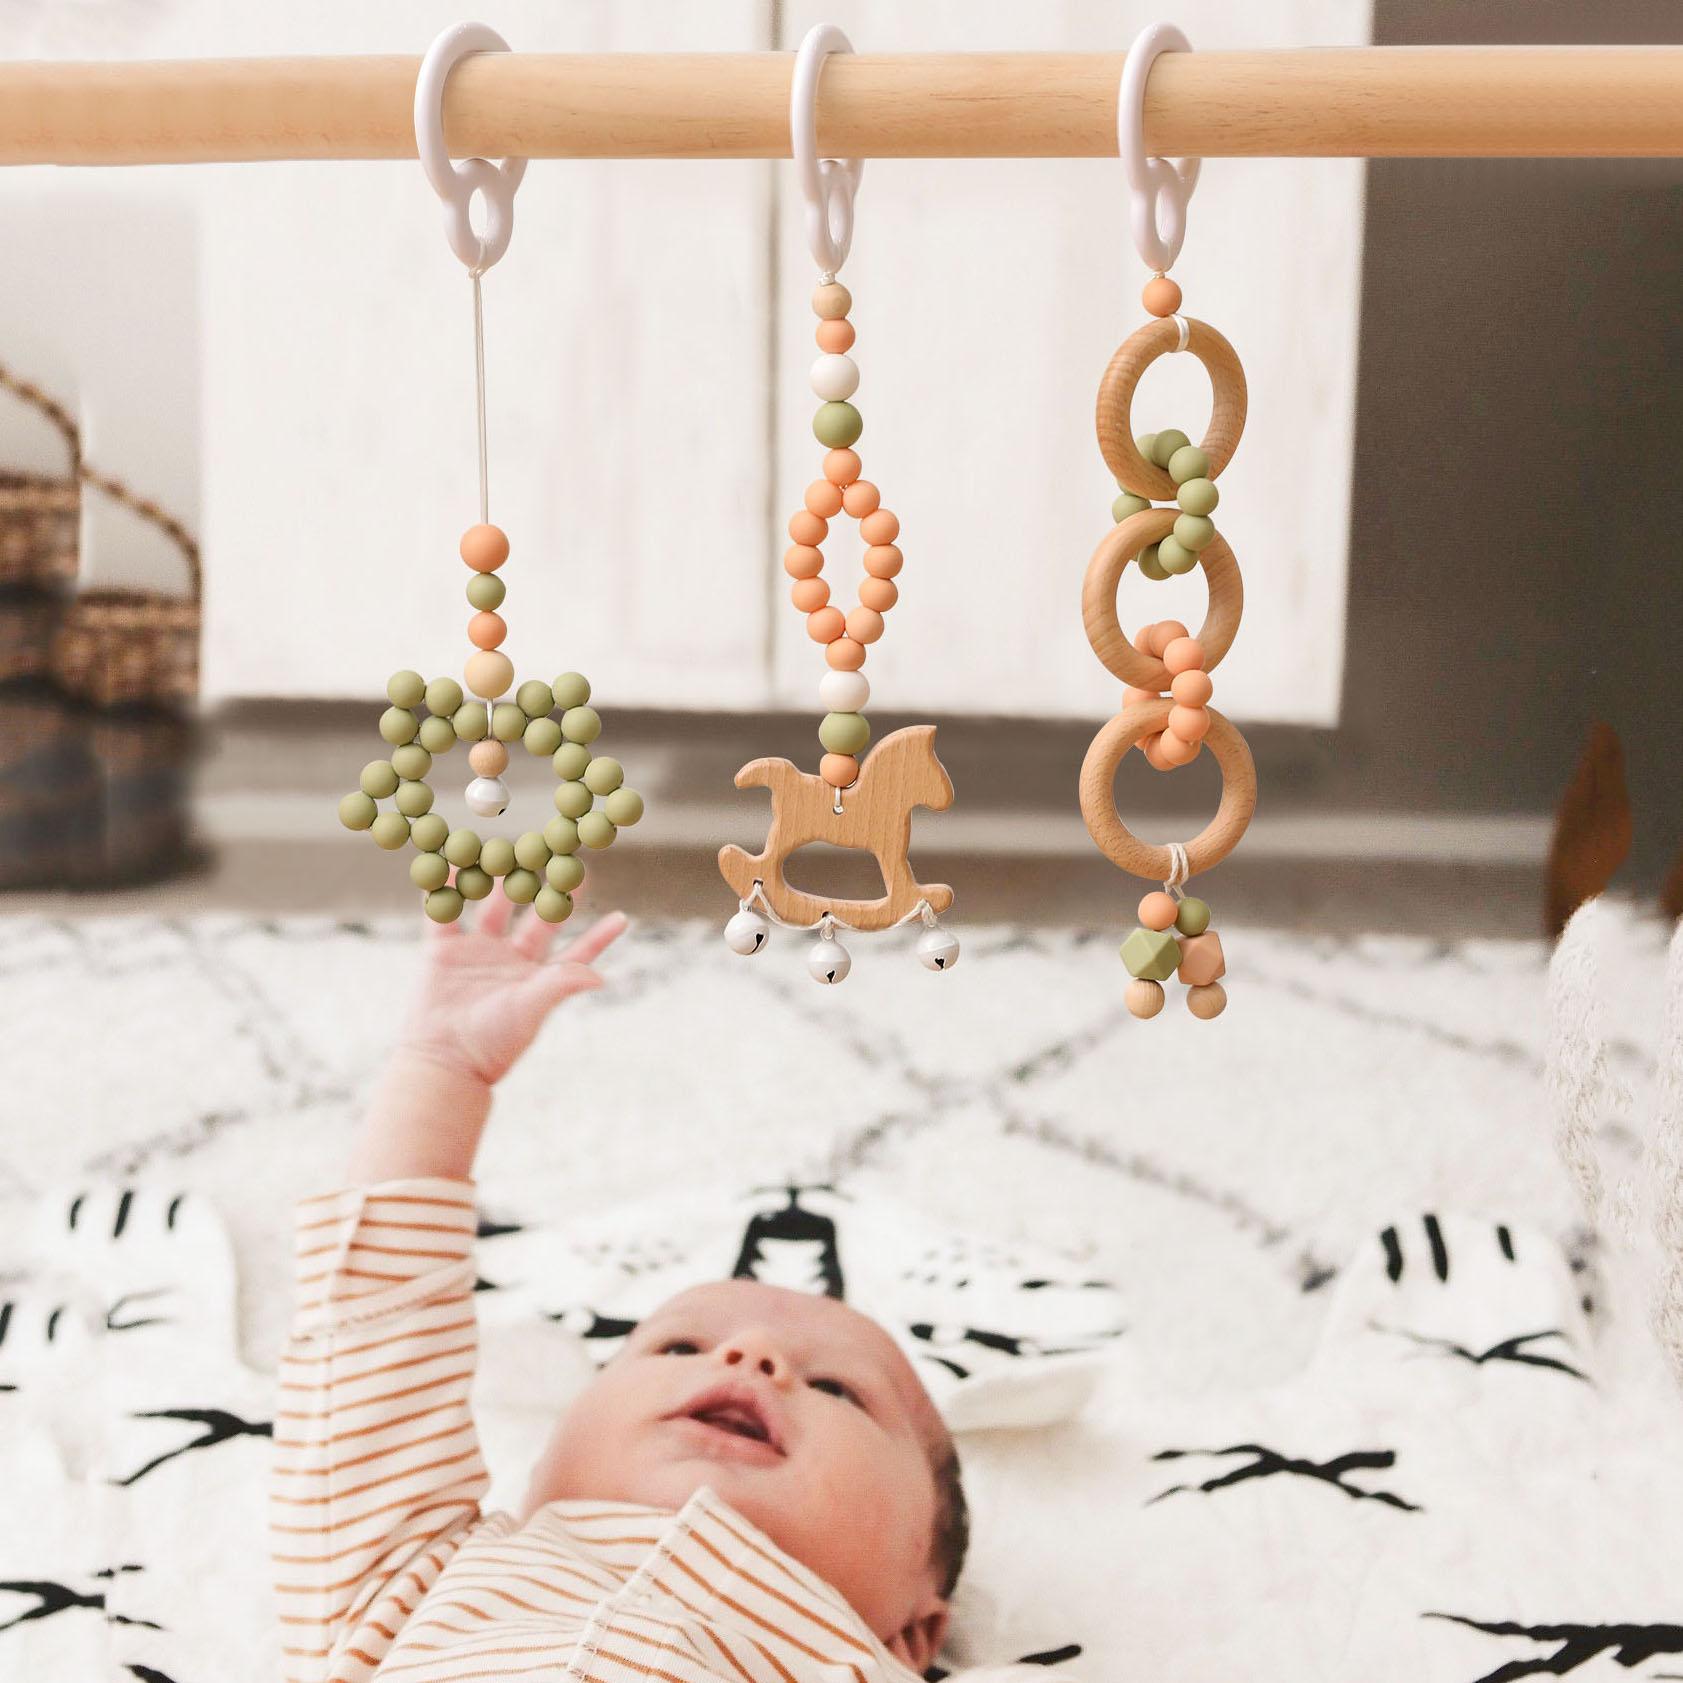 3 pcs/set Baby Gym Frame Stroller Hanging Pendants Wooden Horse Star Infant Teething Nursing Rattle Toys Newborn Room Decoration